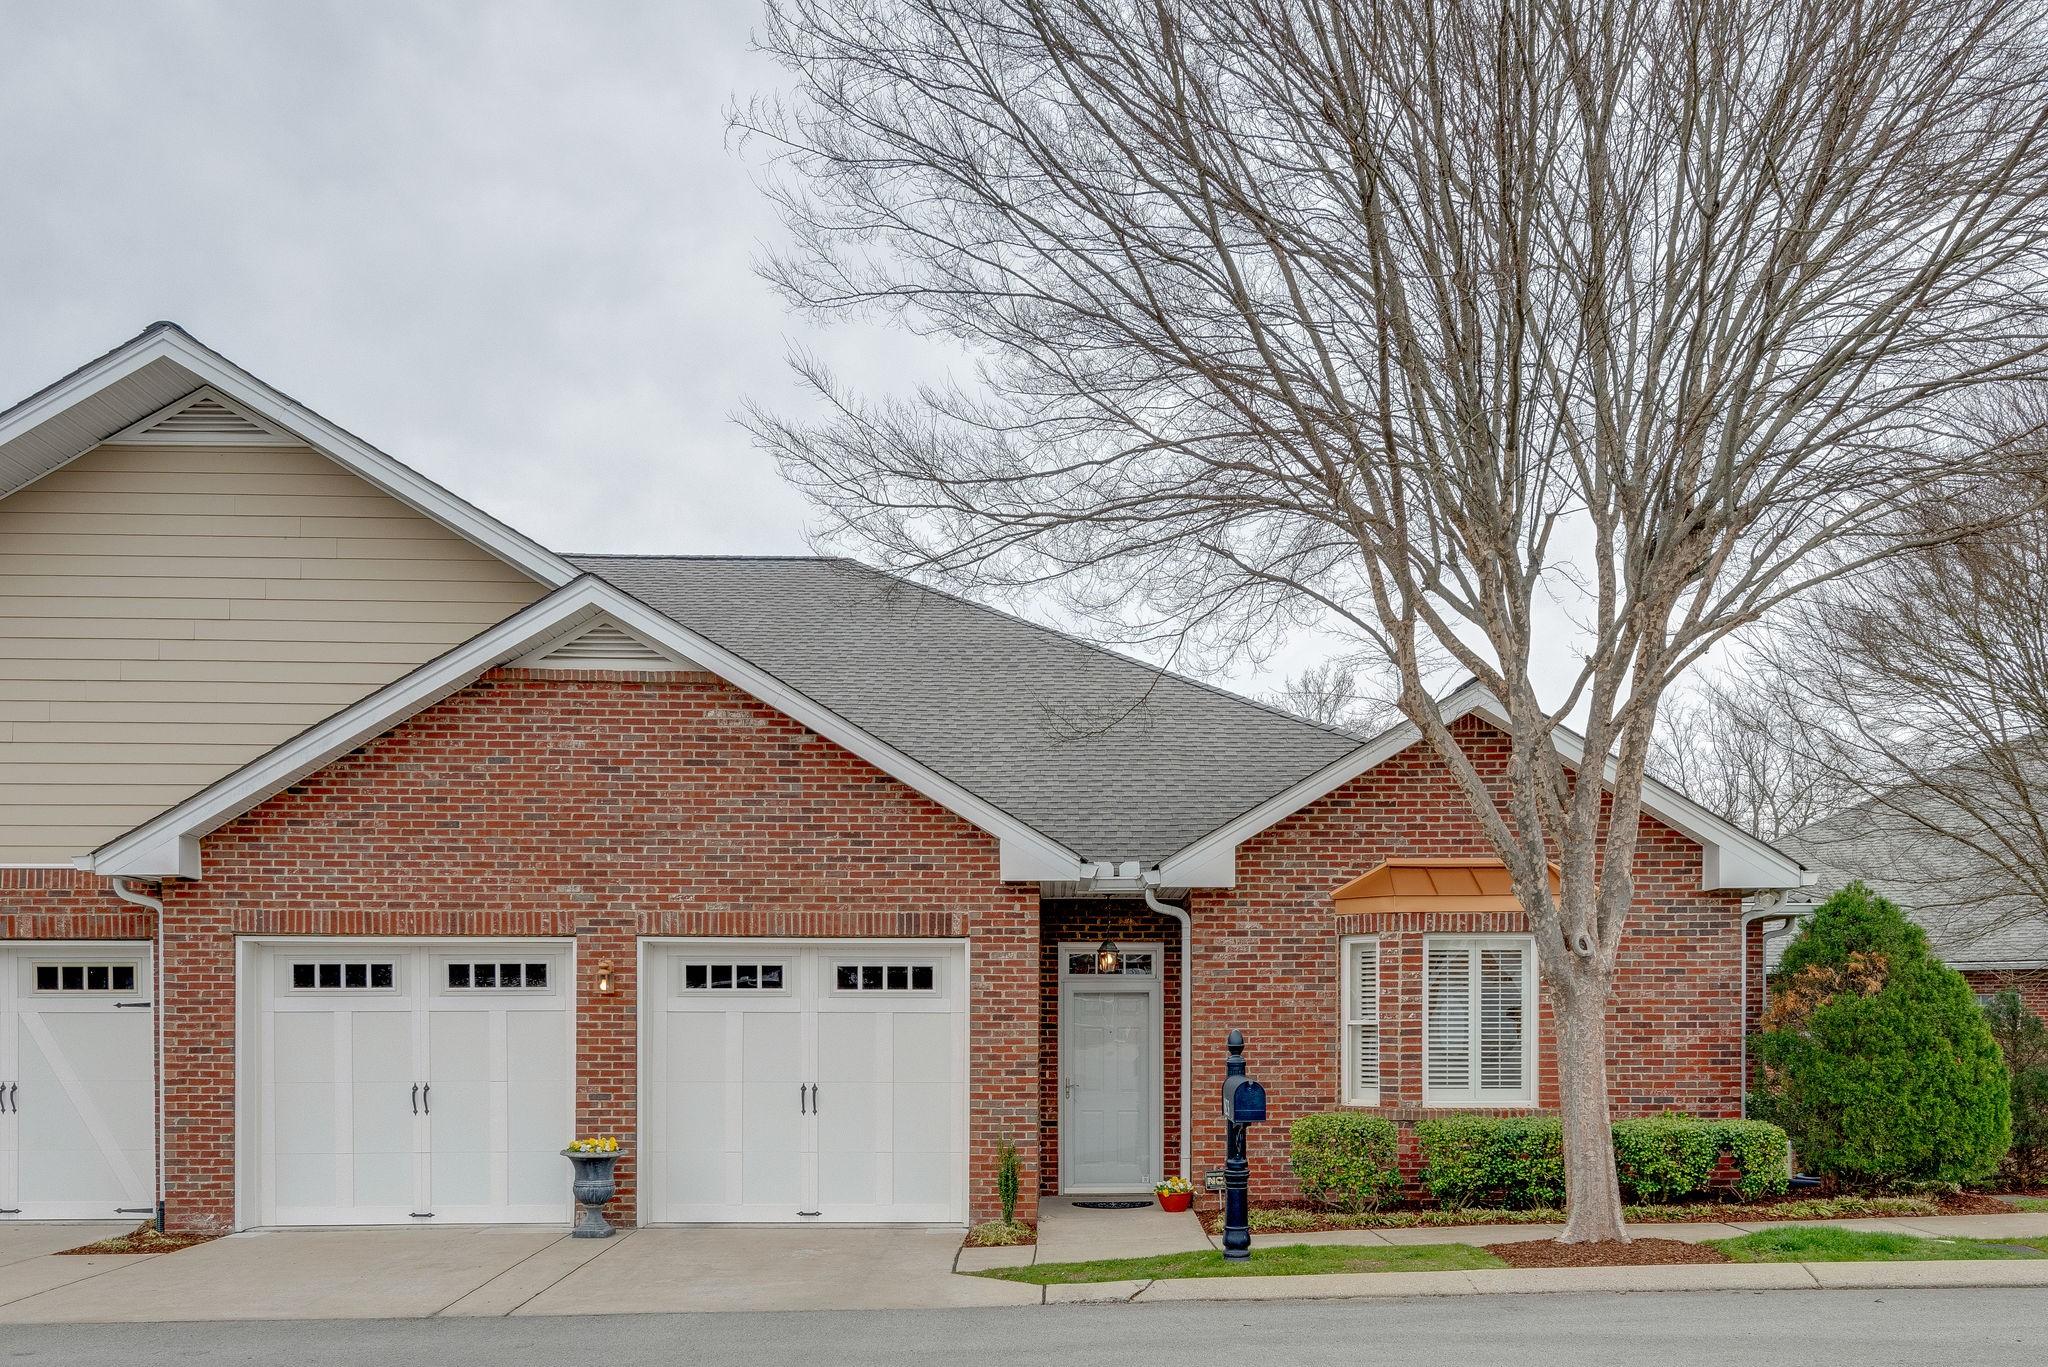 823 Cedarstone Way, Nashville, TN 37214 - Nashville, TN real estate listing